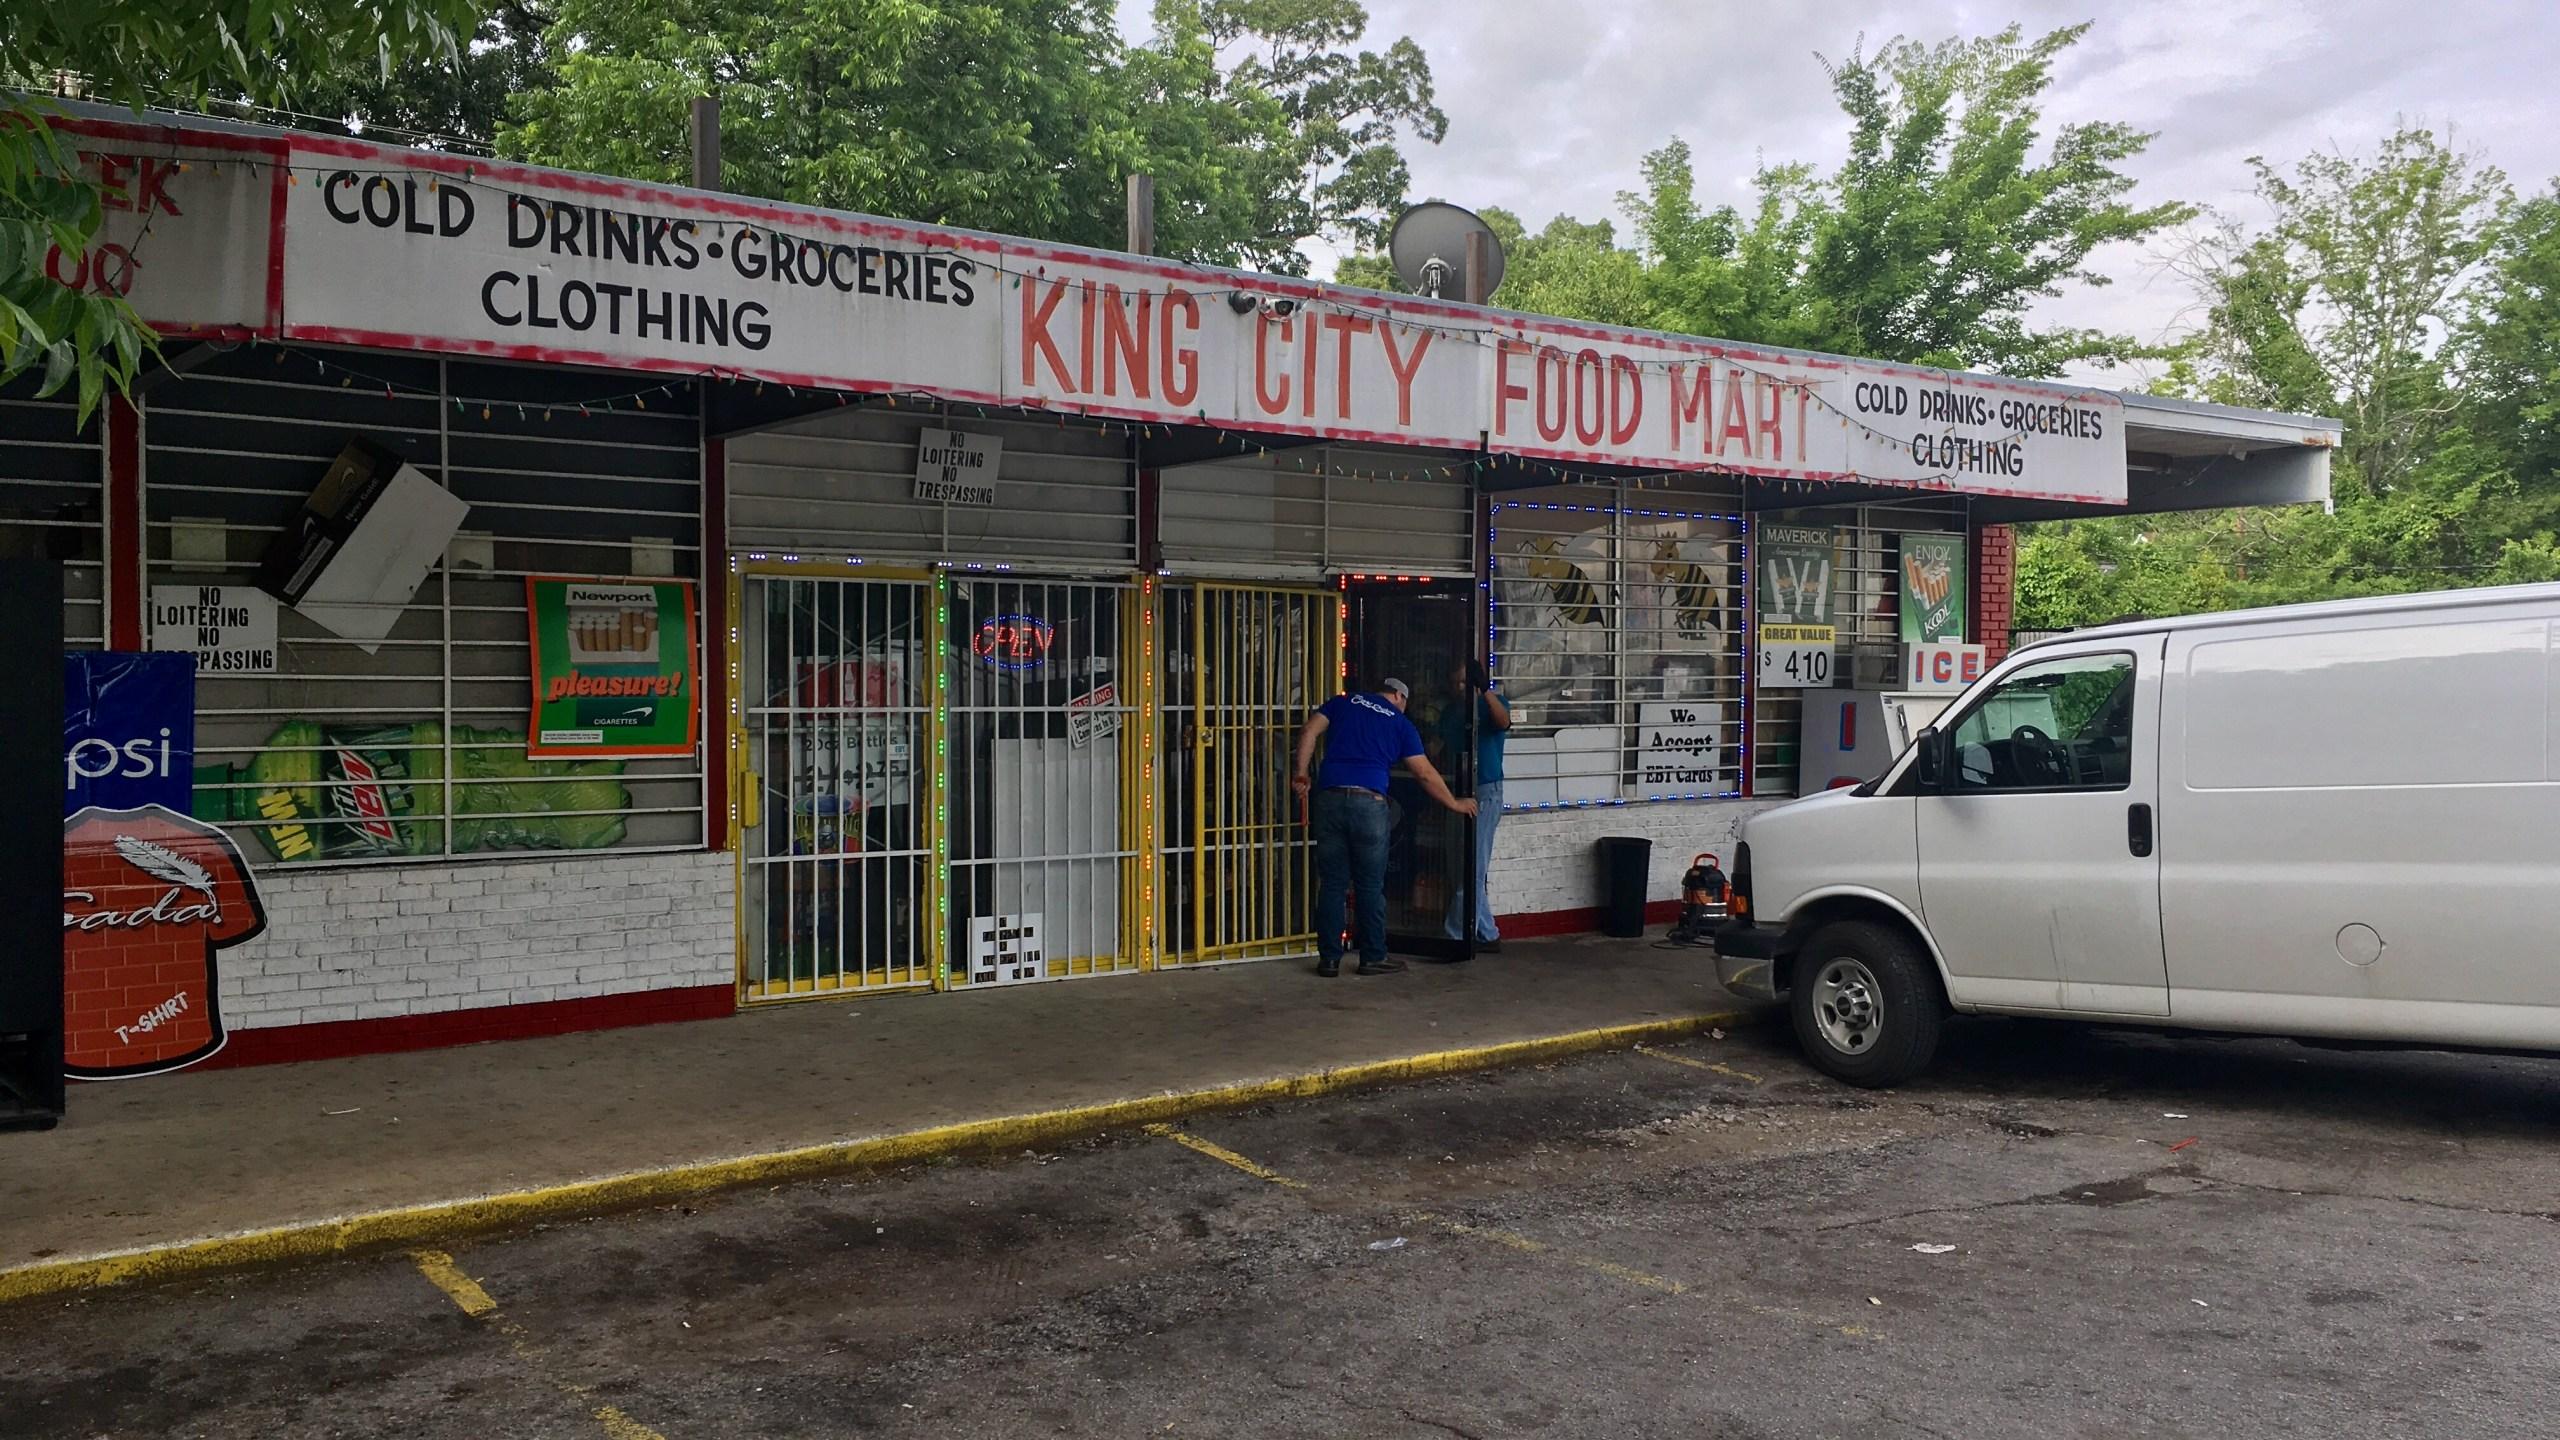 King City Food Mart 1_270668